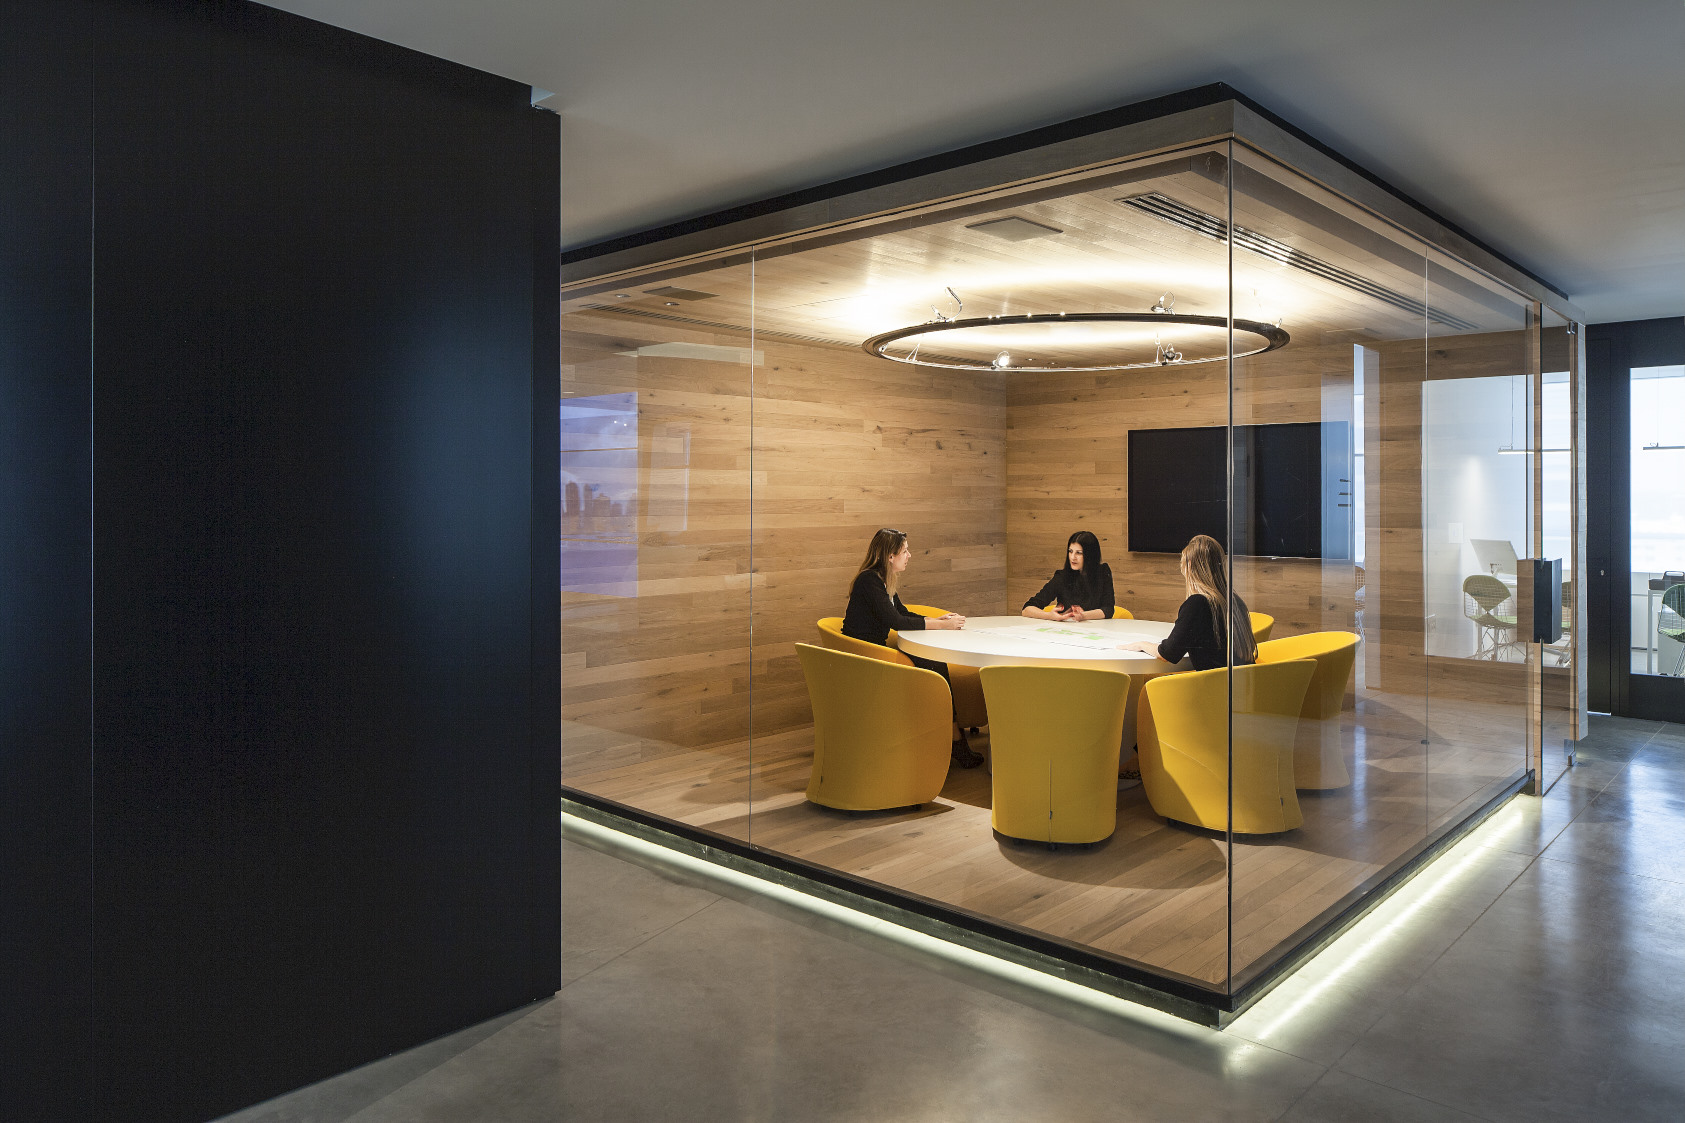 Meeting room. Herzliya, Israel. Architecture by Orly Shrem Architects.